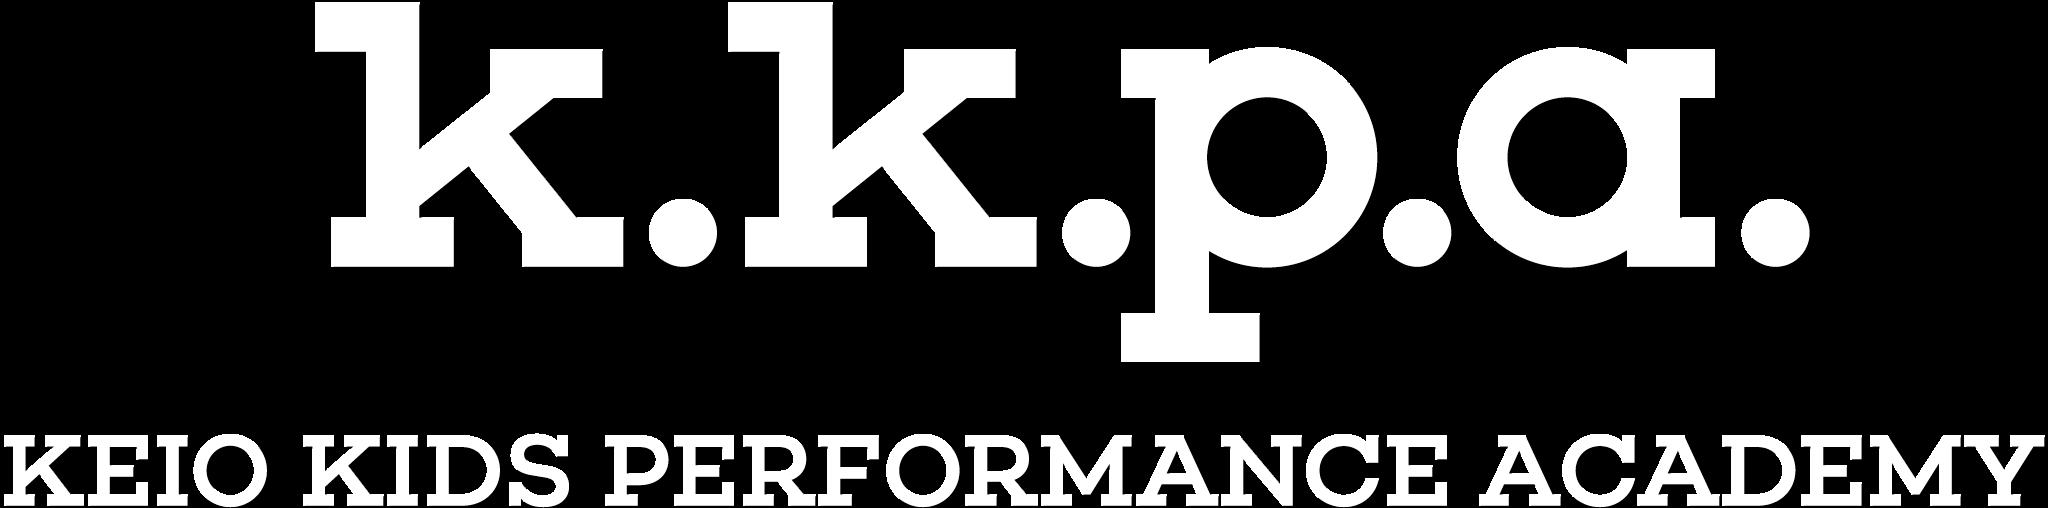 KEIO KIDS PERFORMANCE ACADEMY